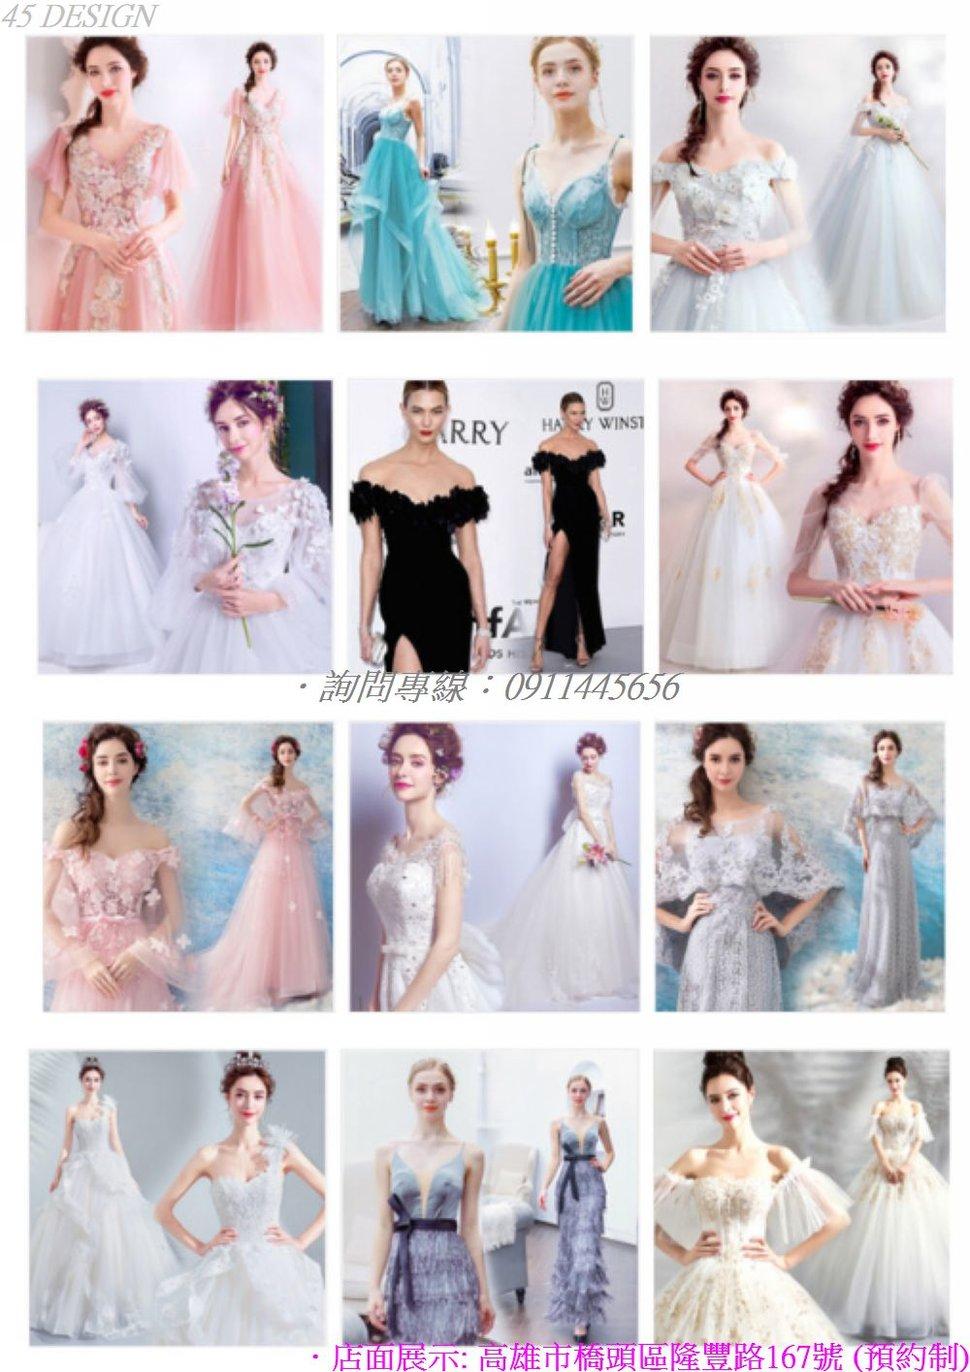 msl190815EDDA57D714204054B6BAE5DF7B4201A2 - 全台最便宜-45DESIGN四五婚紗禮服《結婚吧》